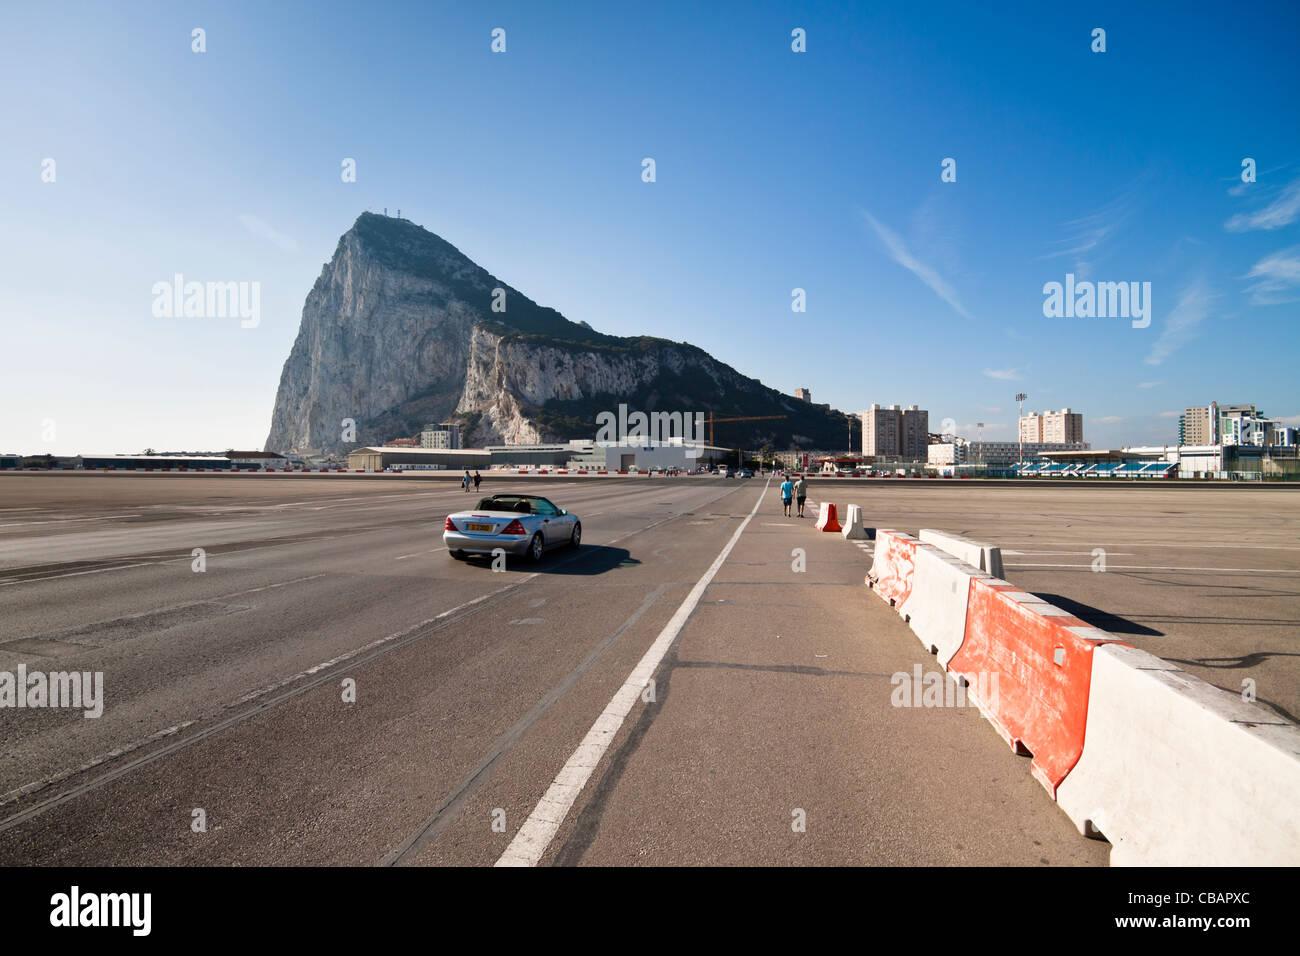 Road Crossing Airport Runway Stock Photos & Road Crossing